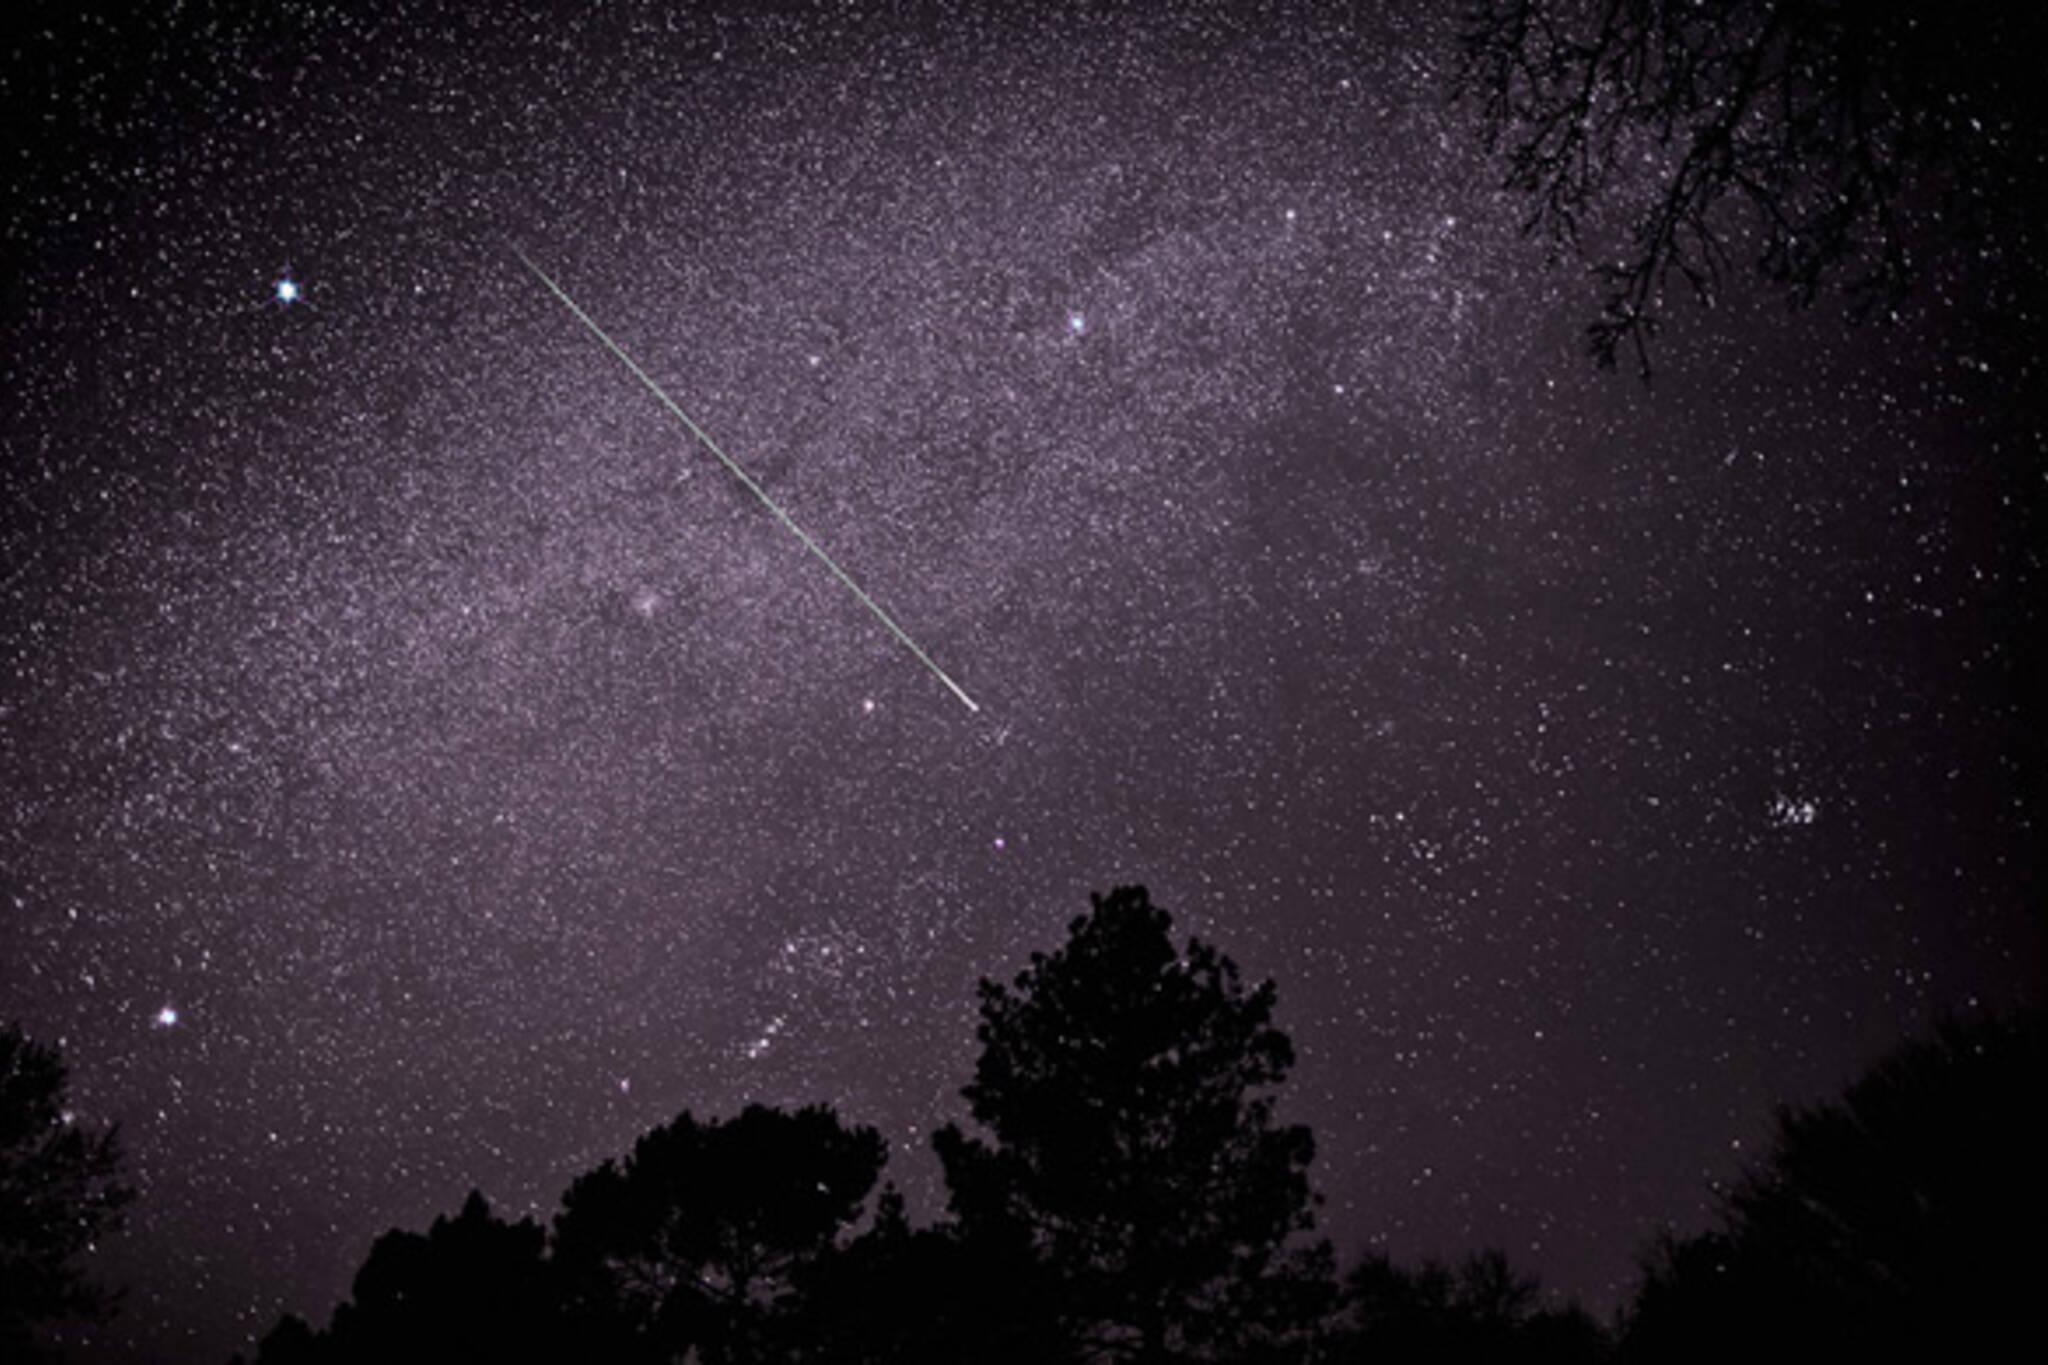 Leonids Meteor Shower 2010